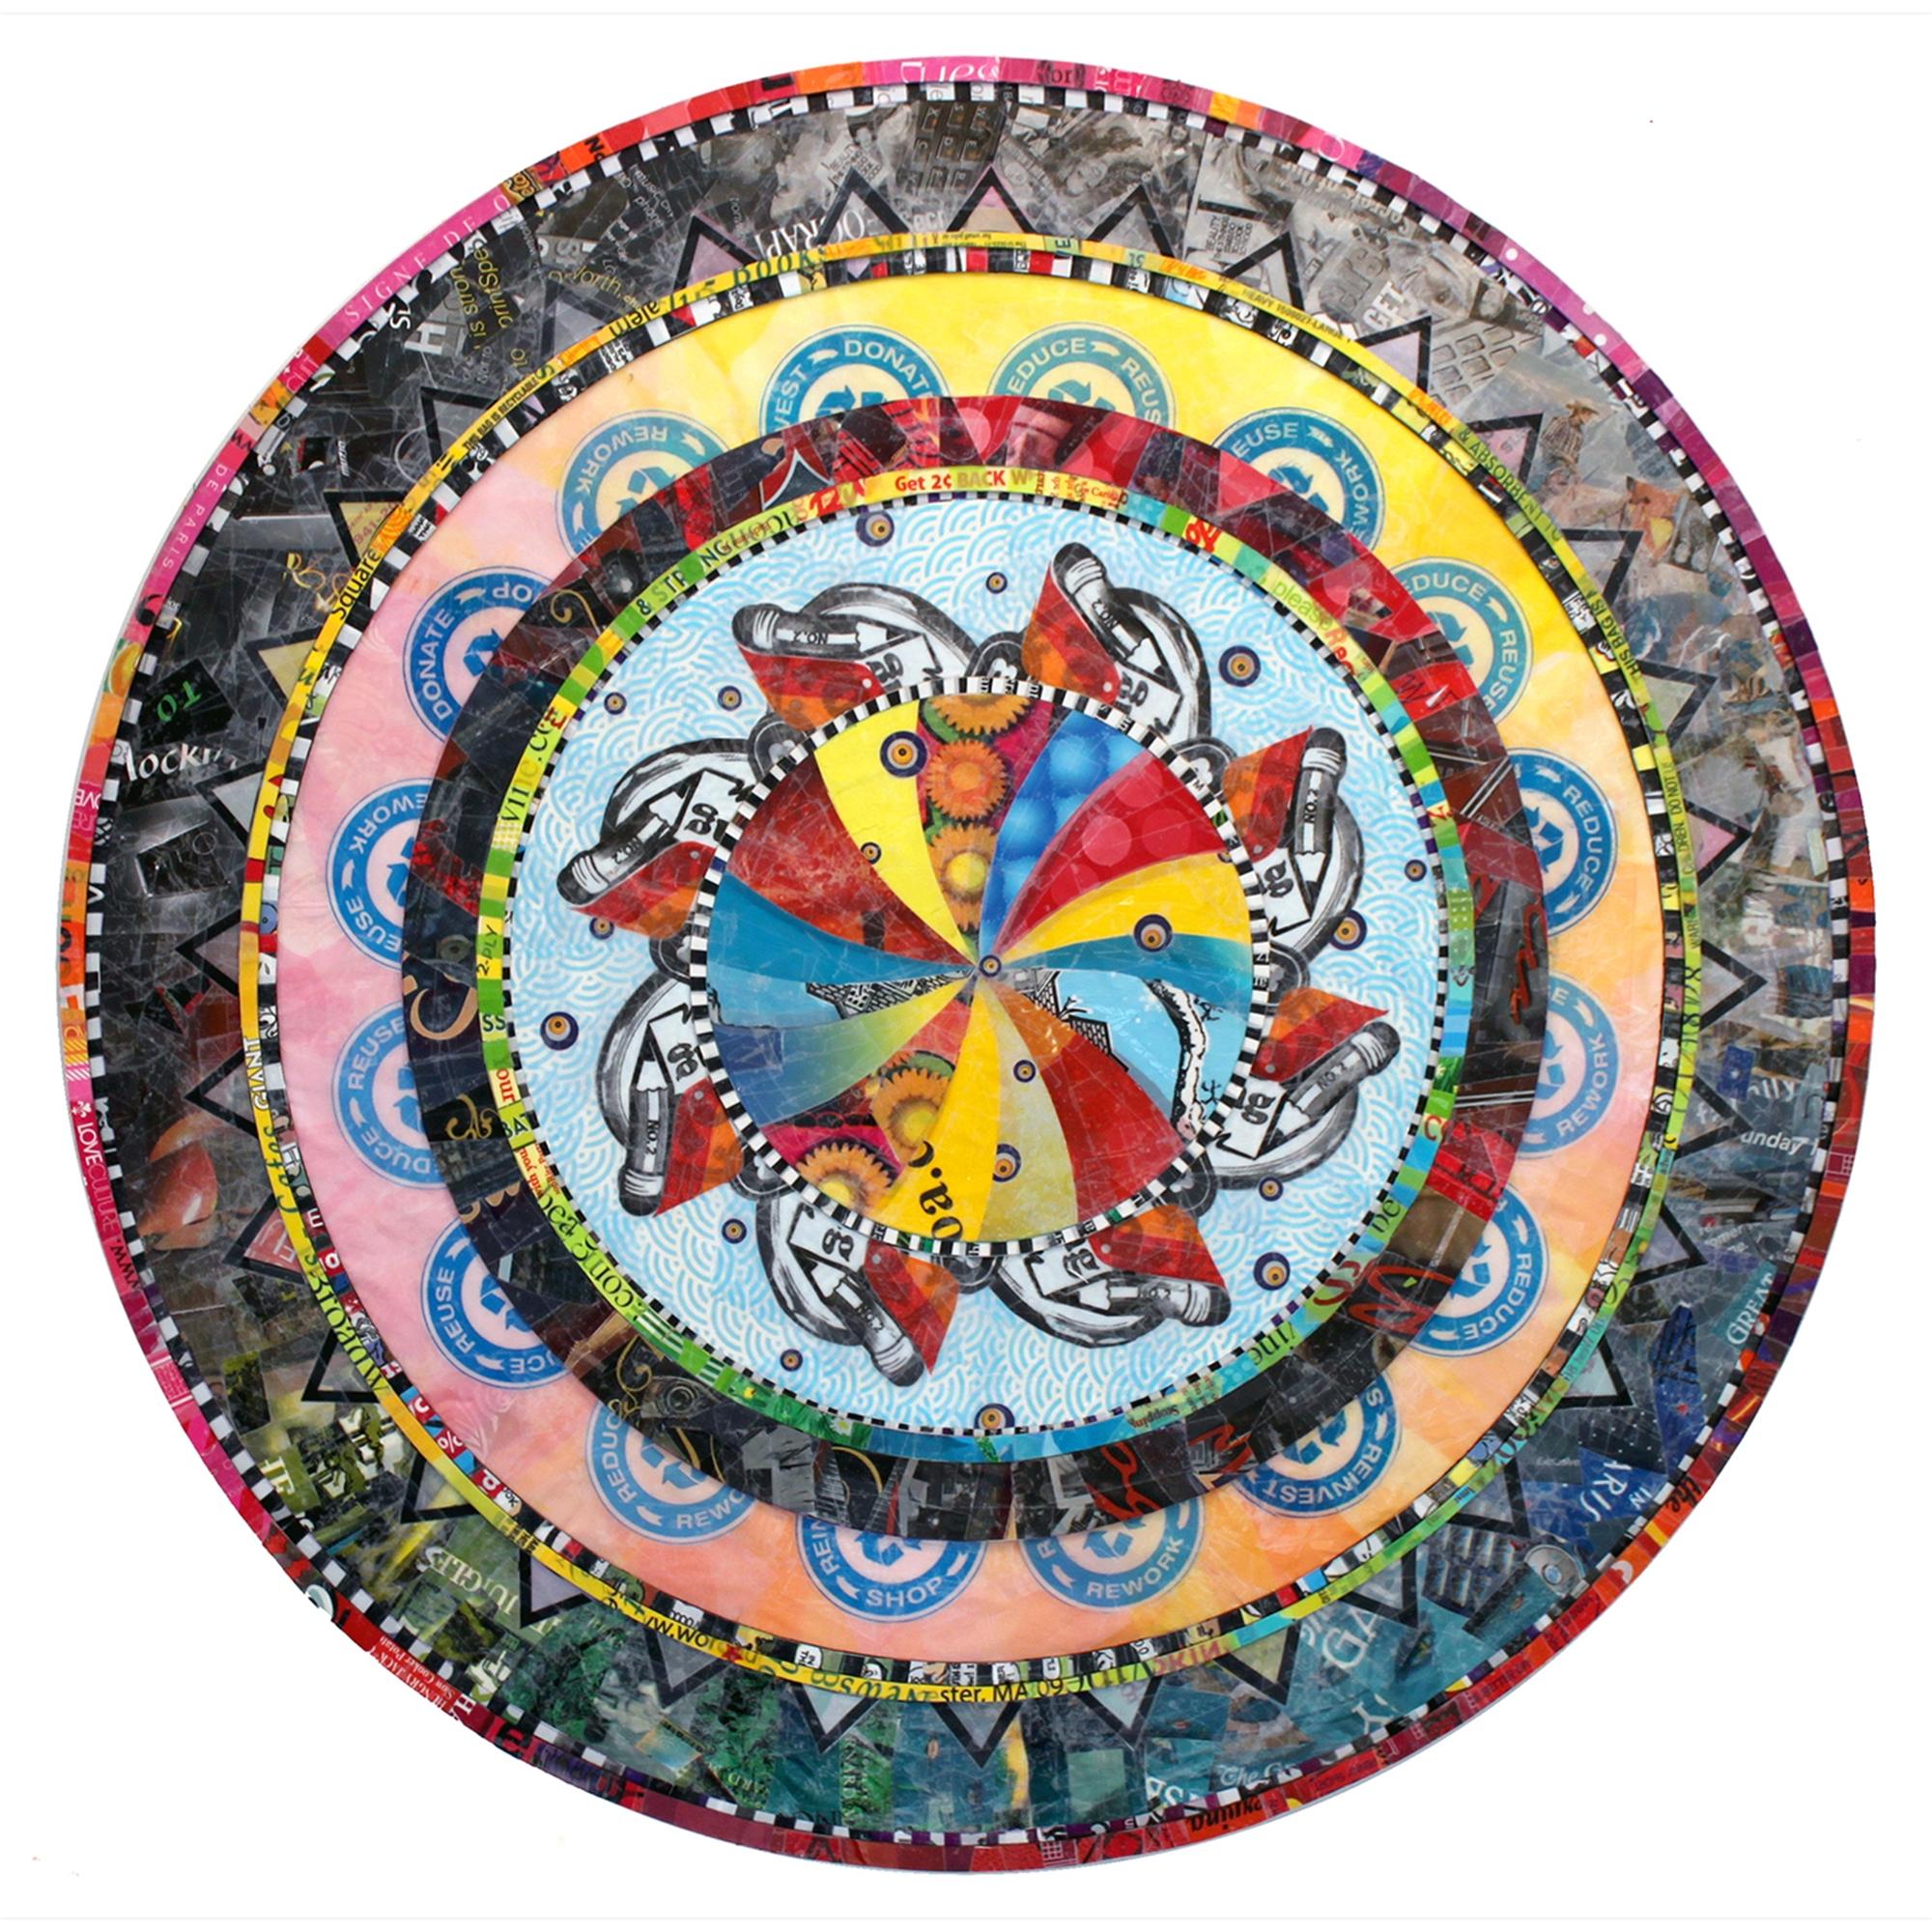 Revelation Mandala by Virginia Fleck